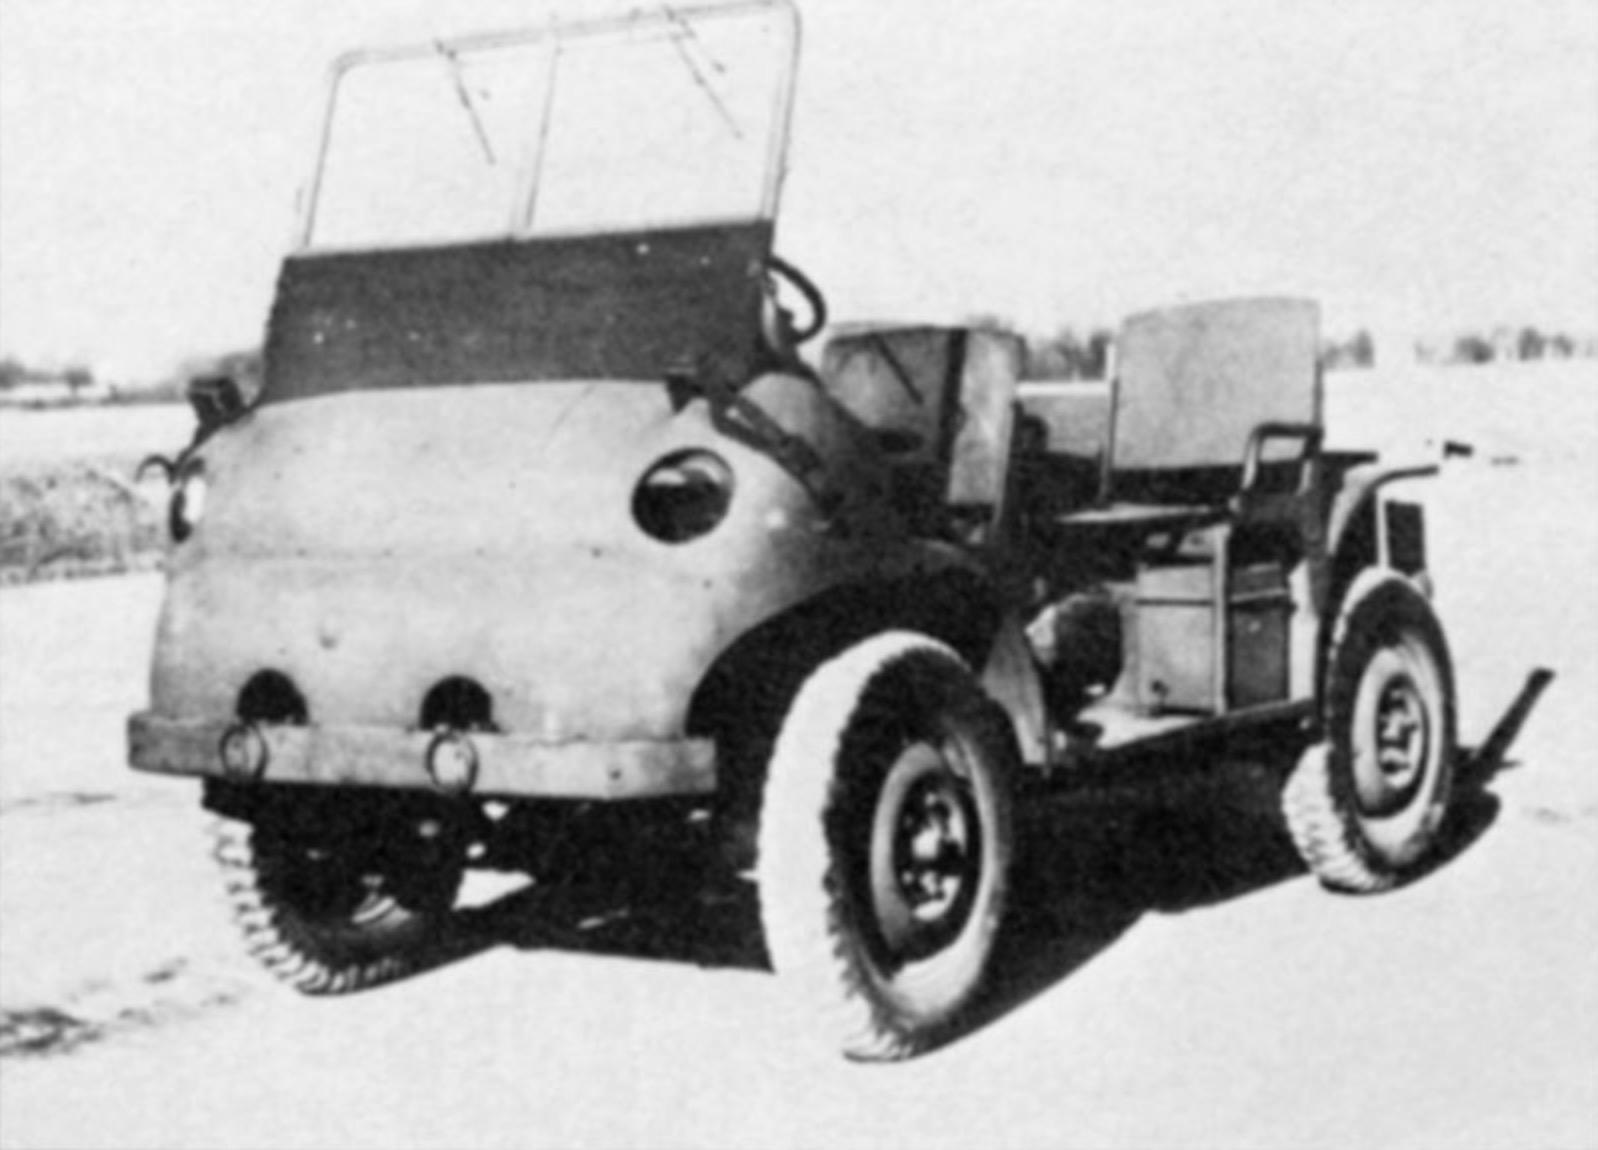 Willy WAC - Vista frontal izquierda